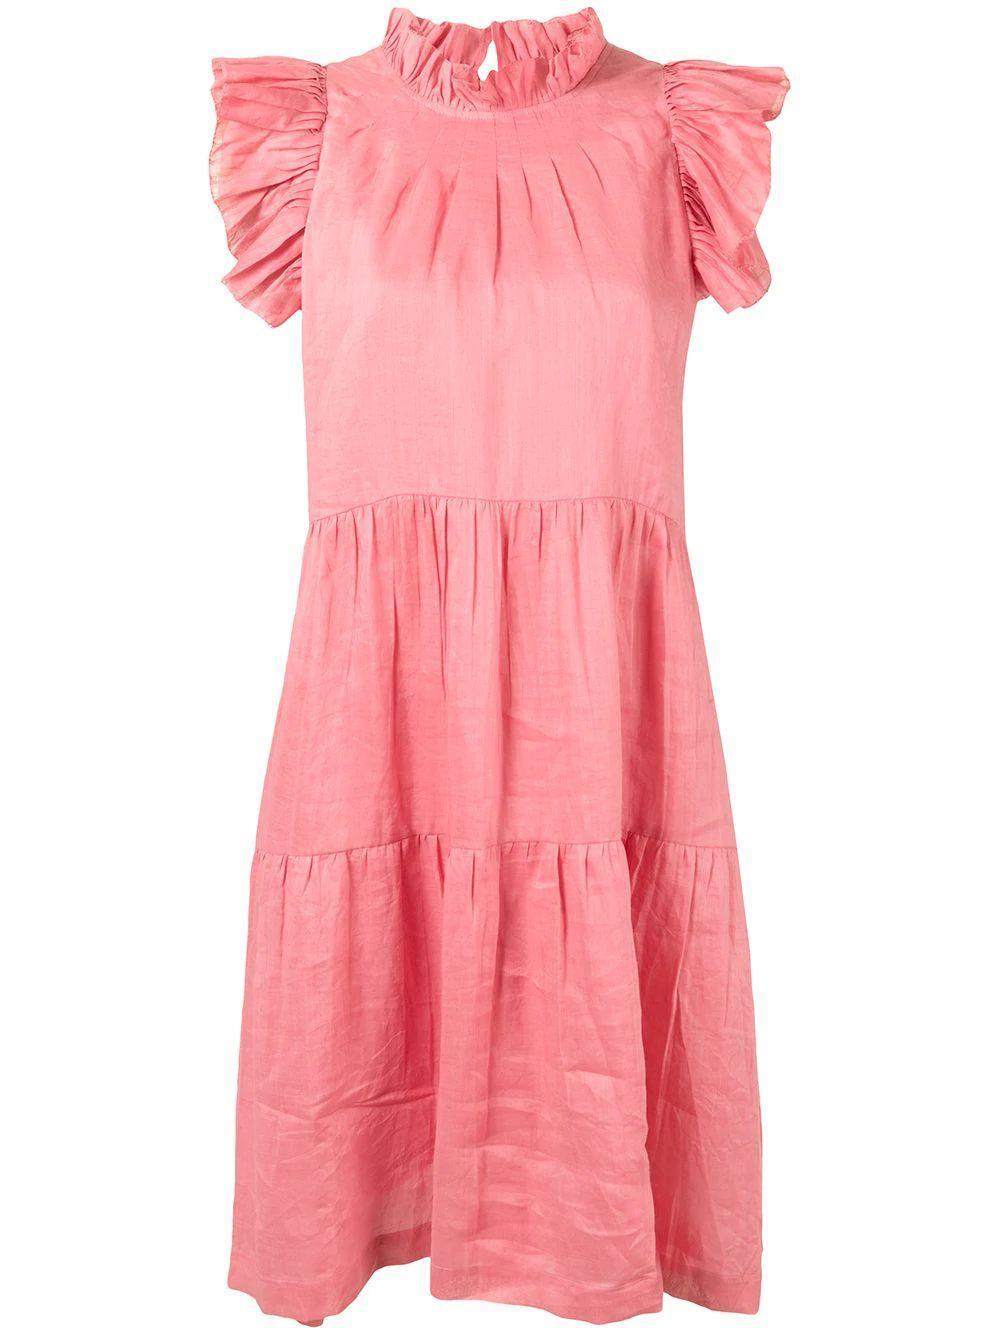 Hattie Tiered Dress Item # RS21-20